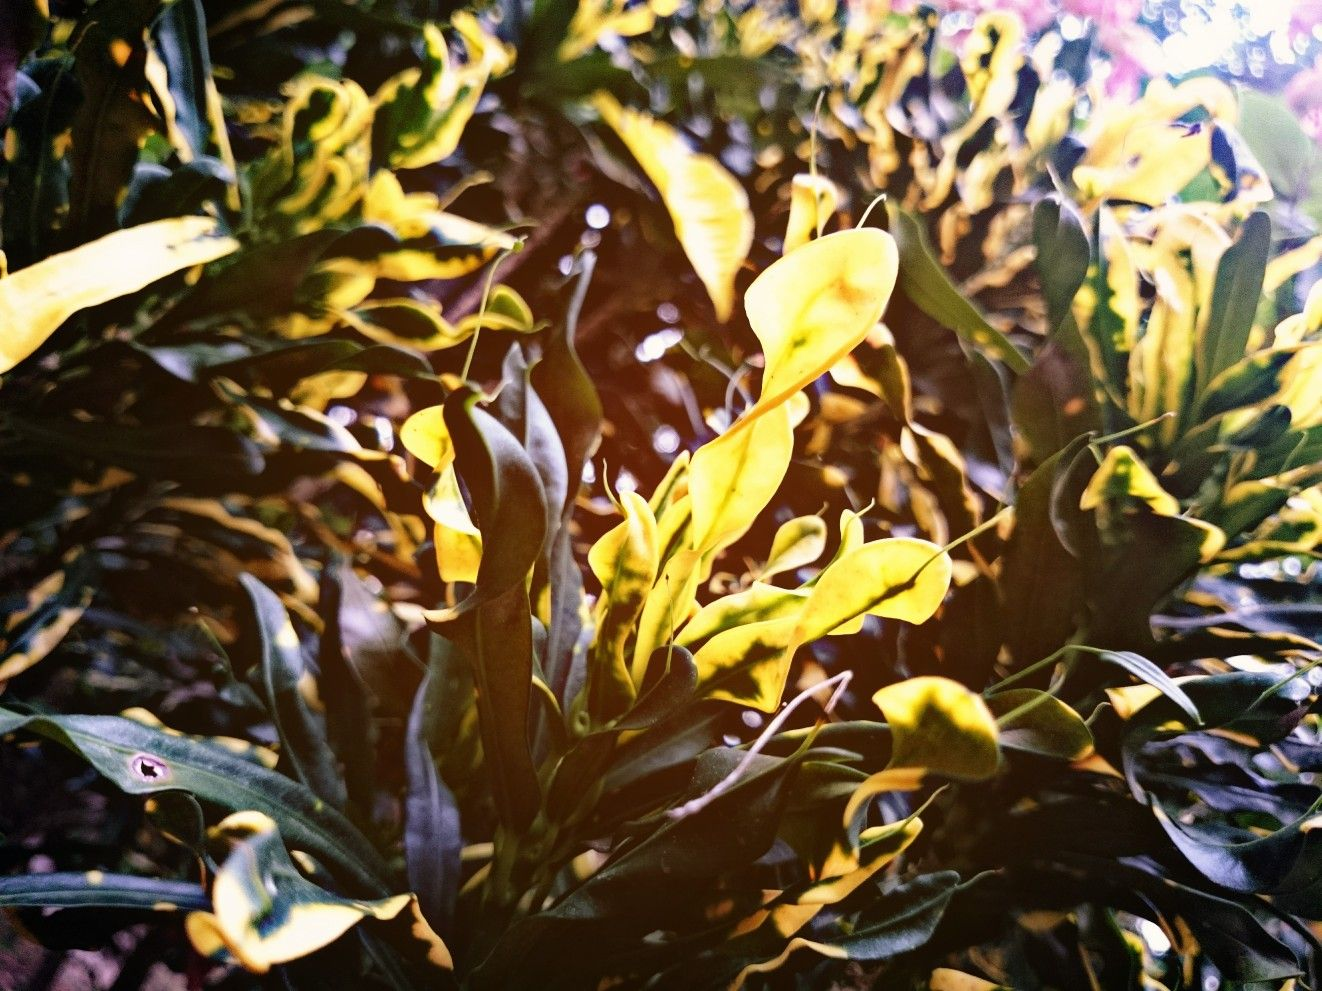 Pin by Rahul Dileep on cliCkz Plants